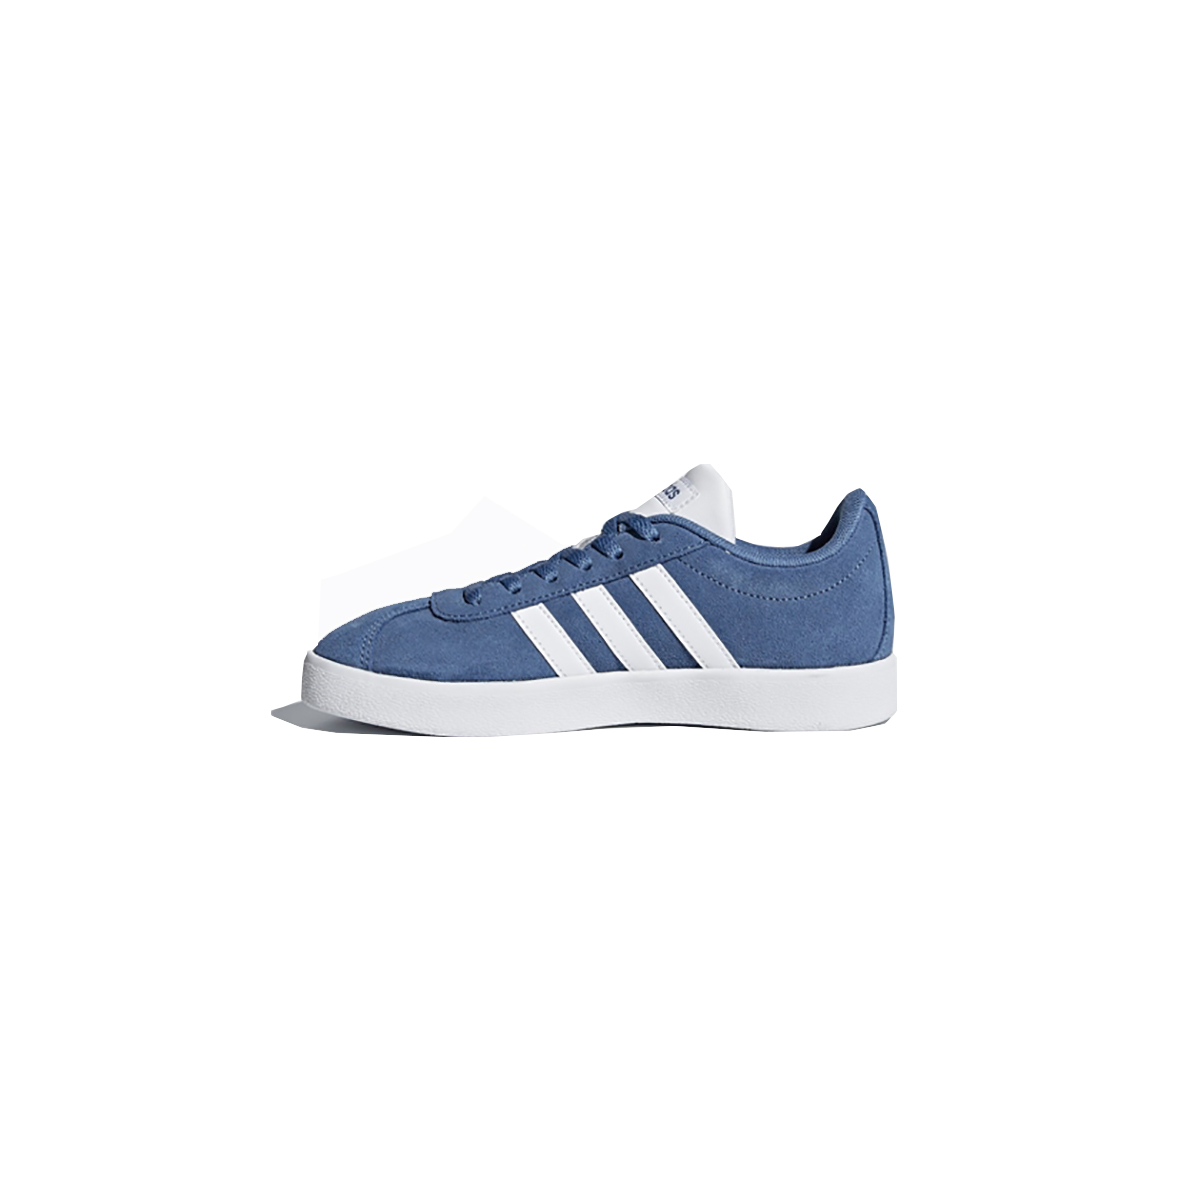 adidas vl court 2k db1830